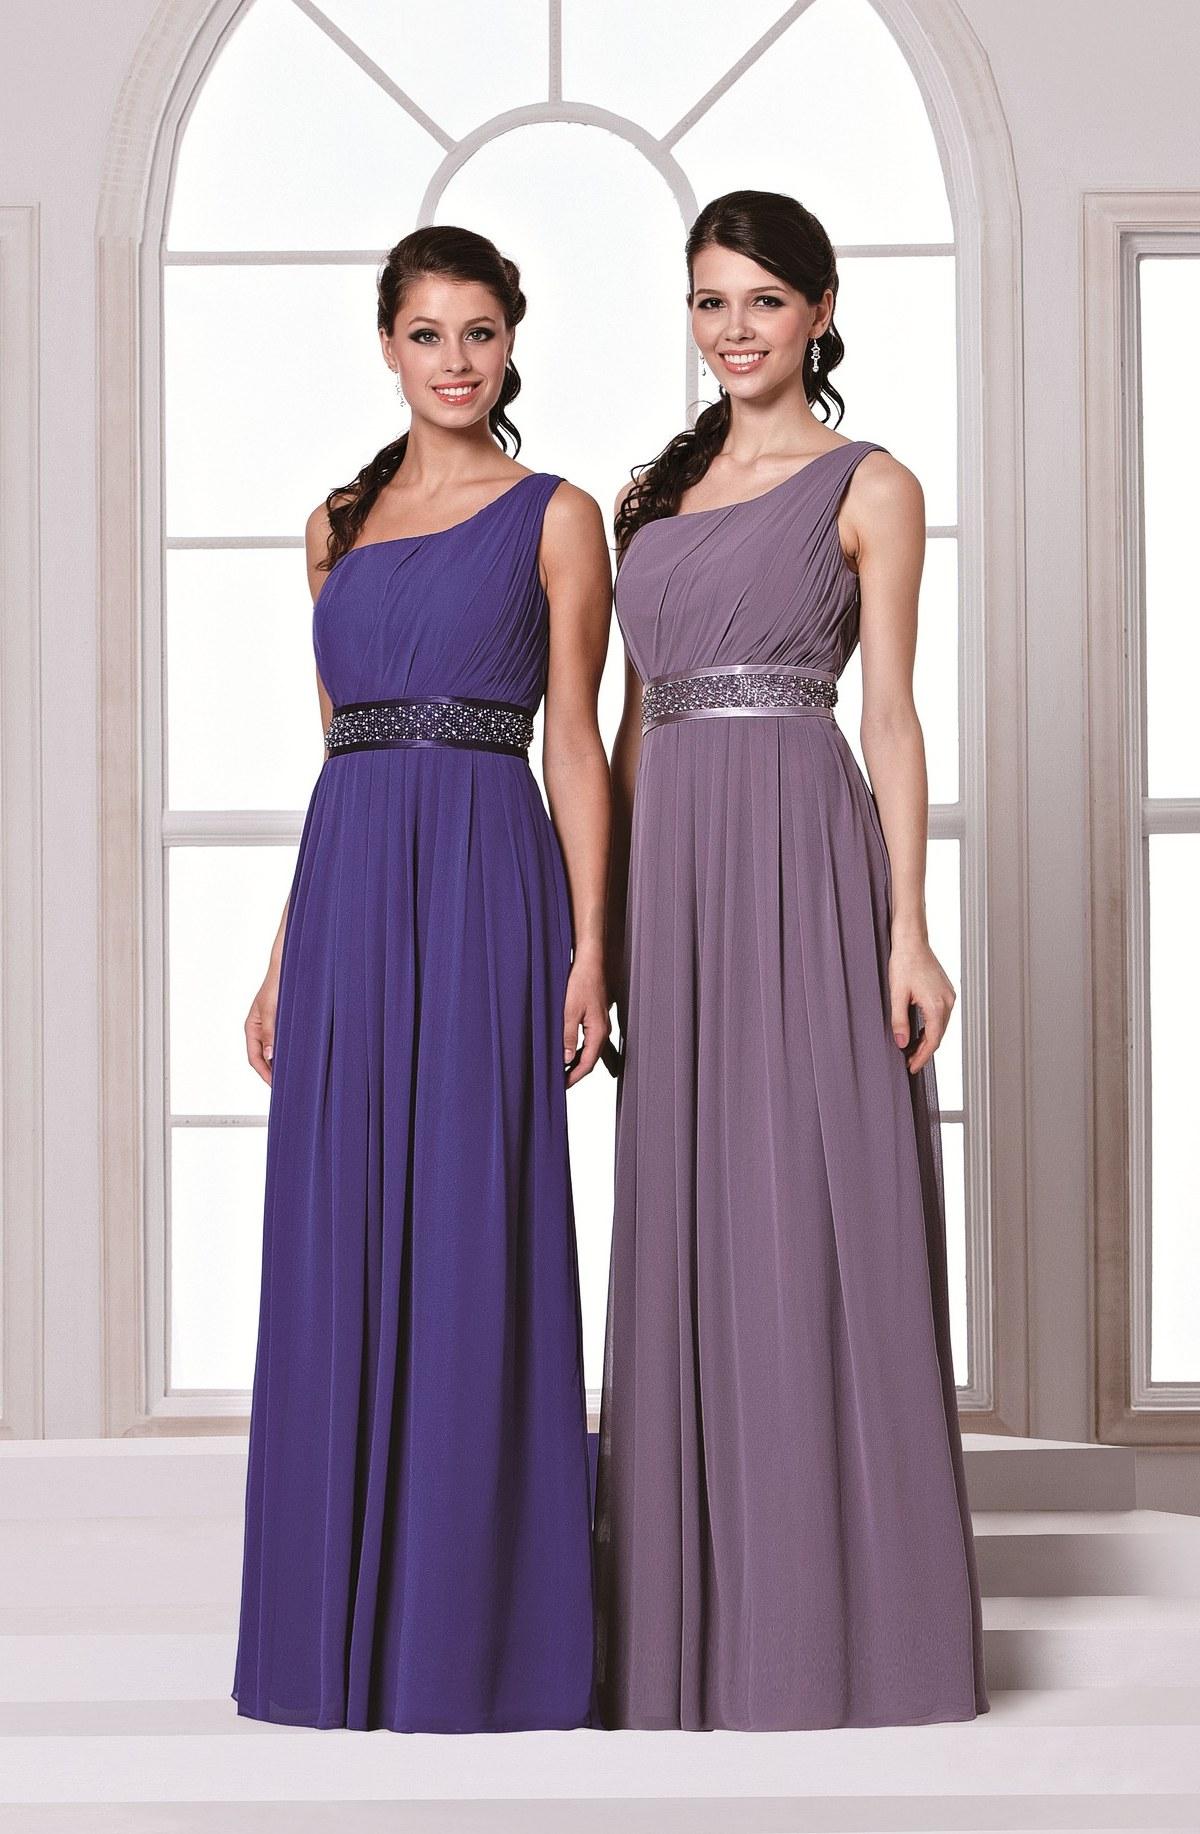 BM Sale Dress - D'Zage - dab11251-regency-purple